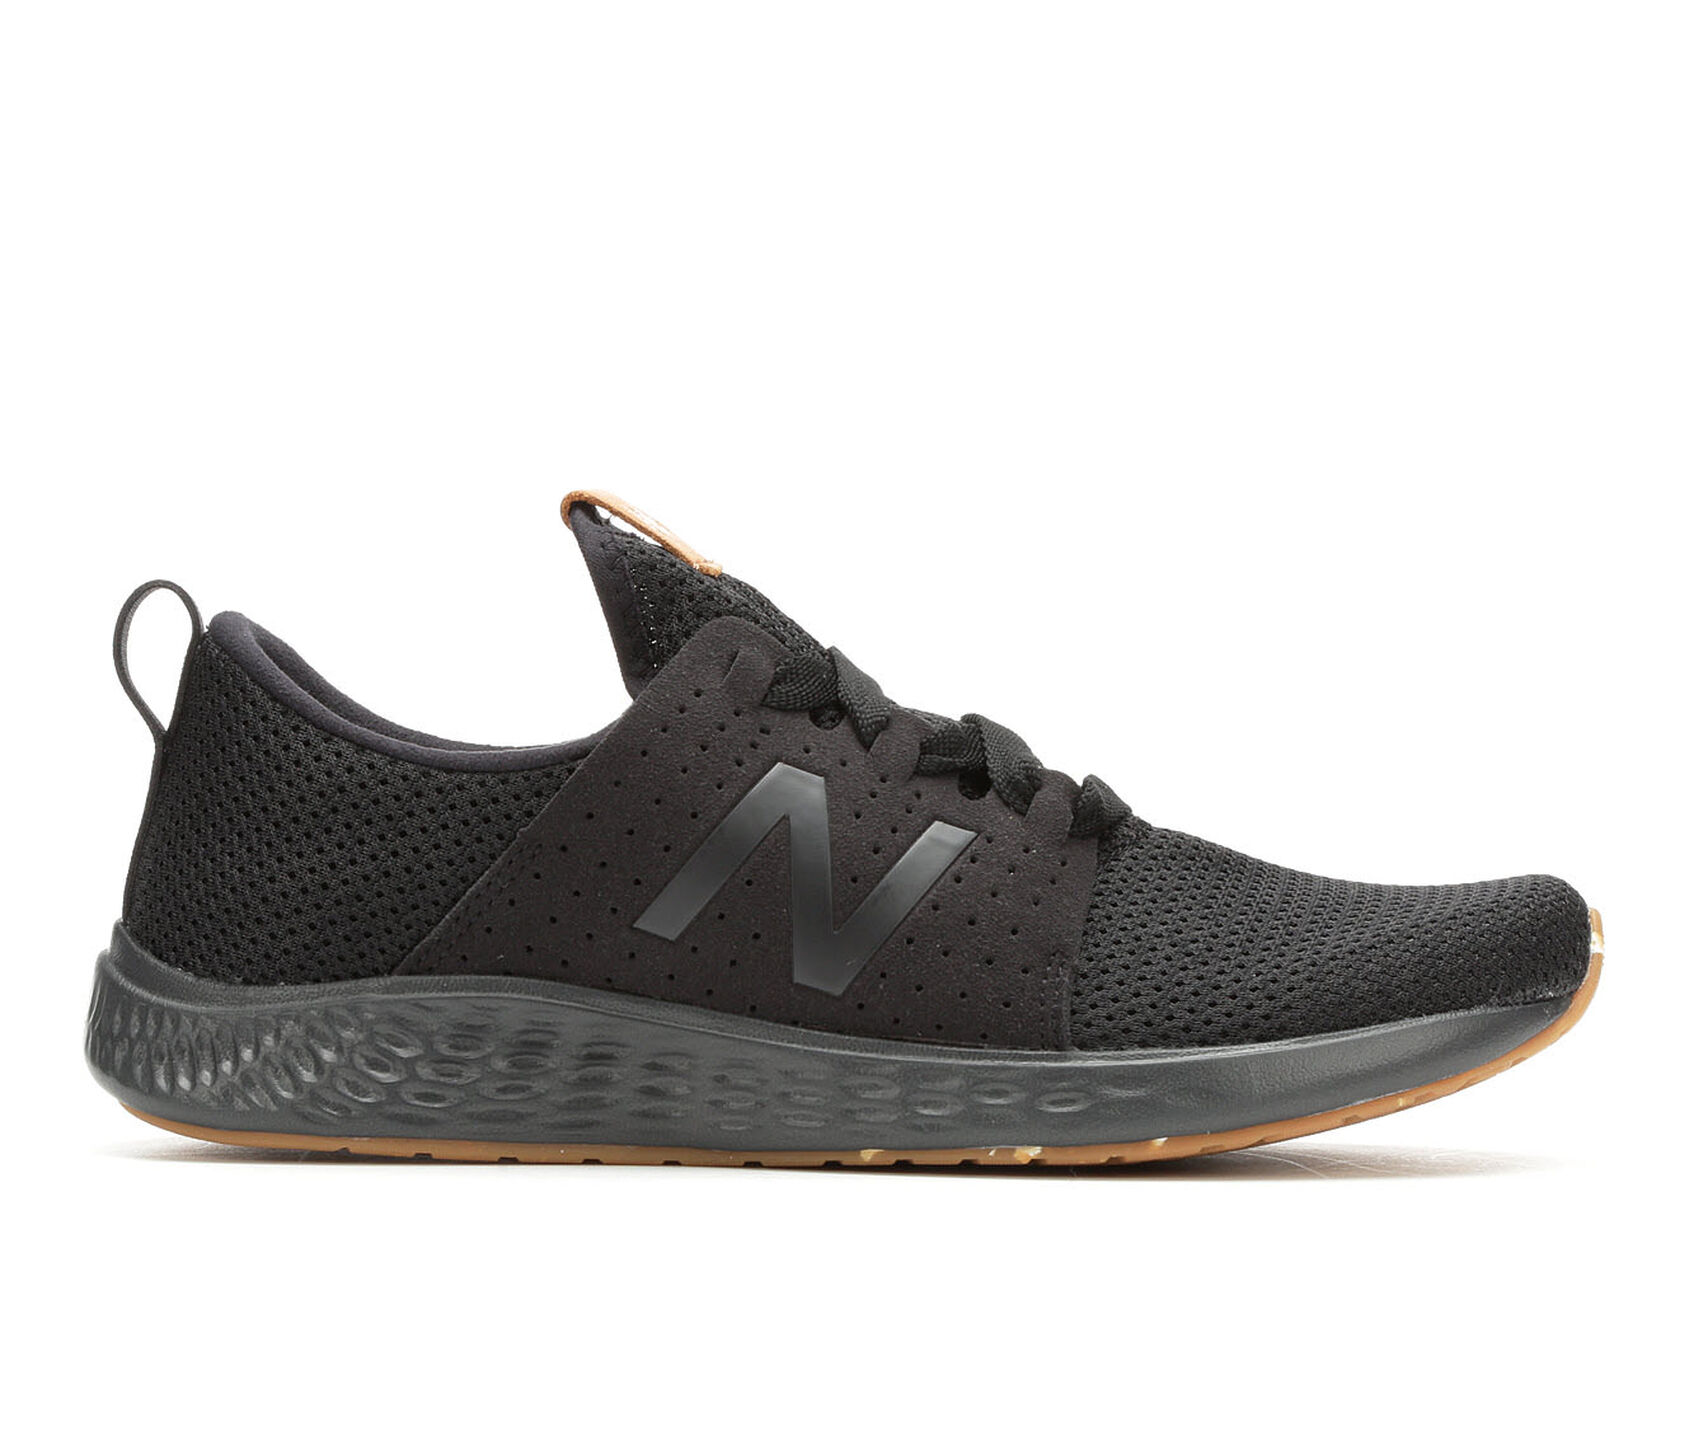 d977152596 Men's New Balance Fresh Foam Sport Running Shoes | Shoe Carnival